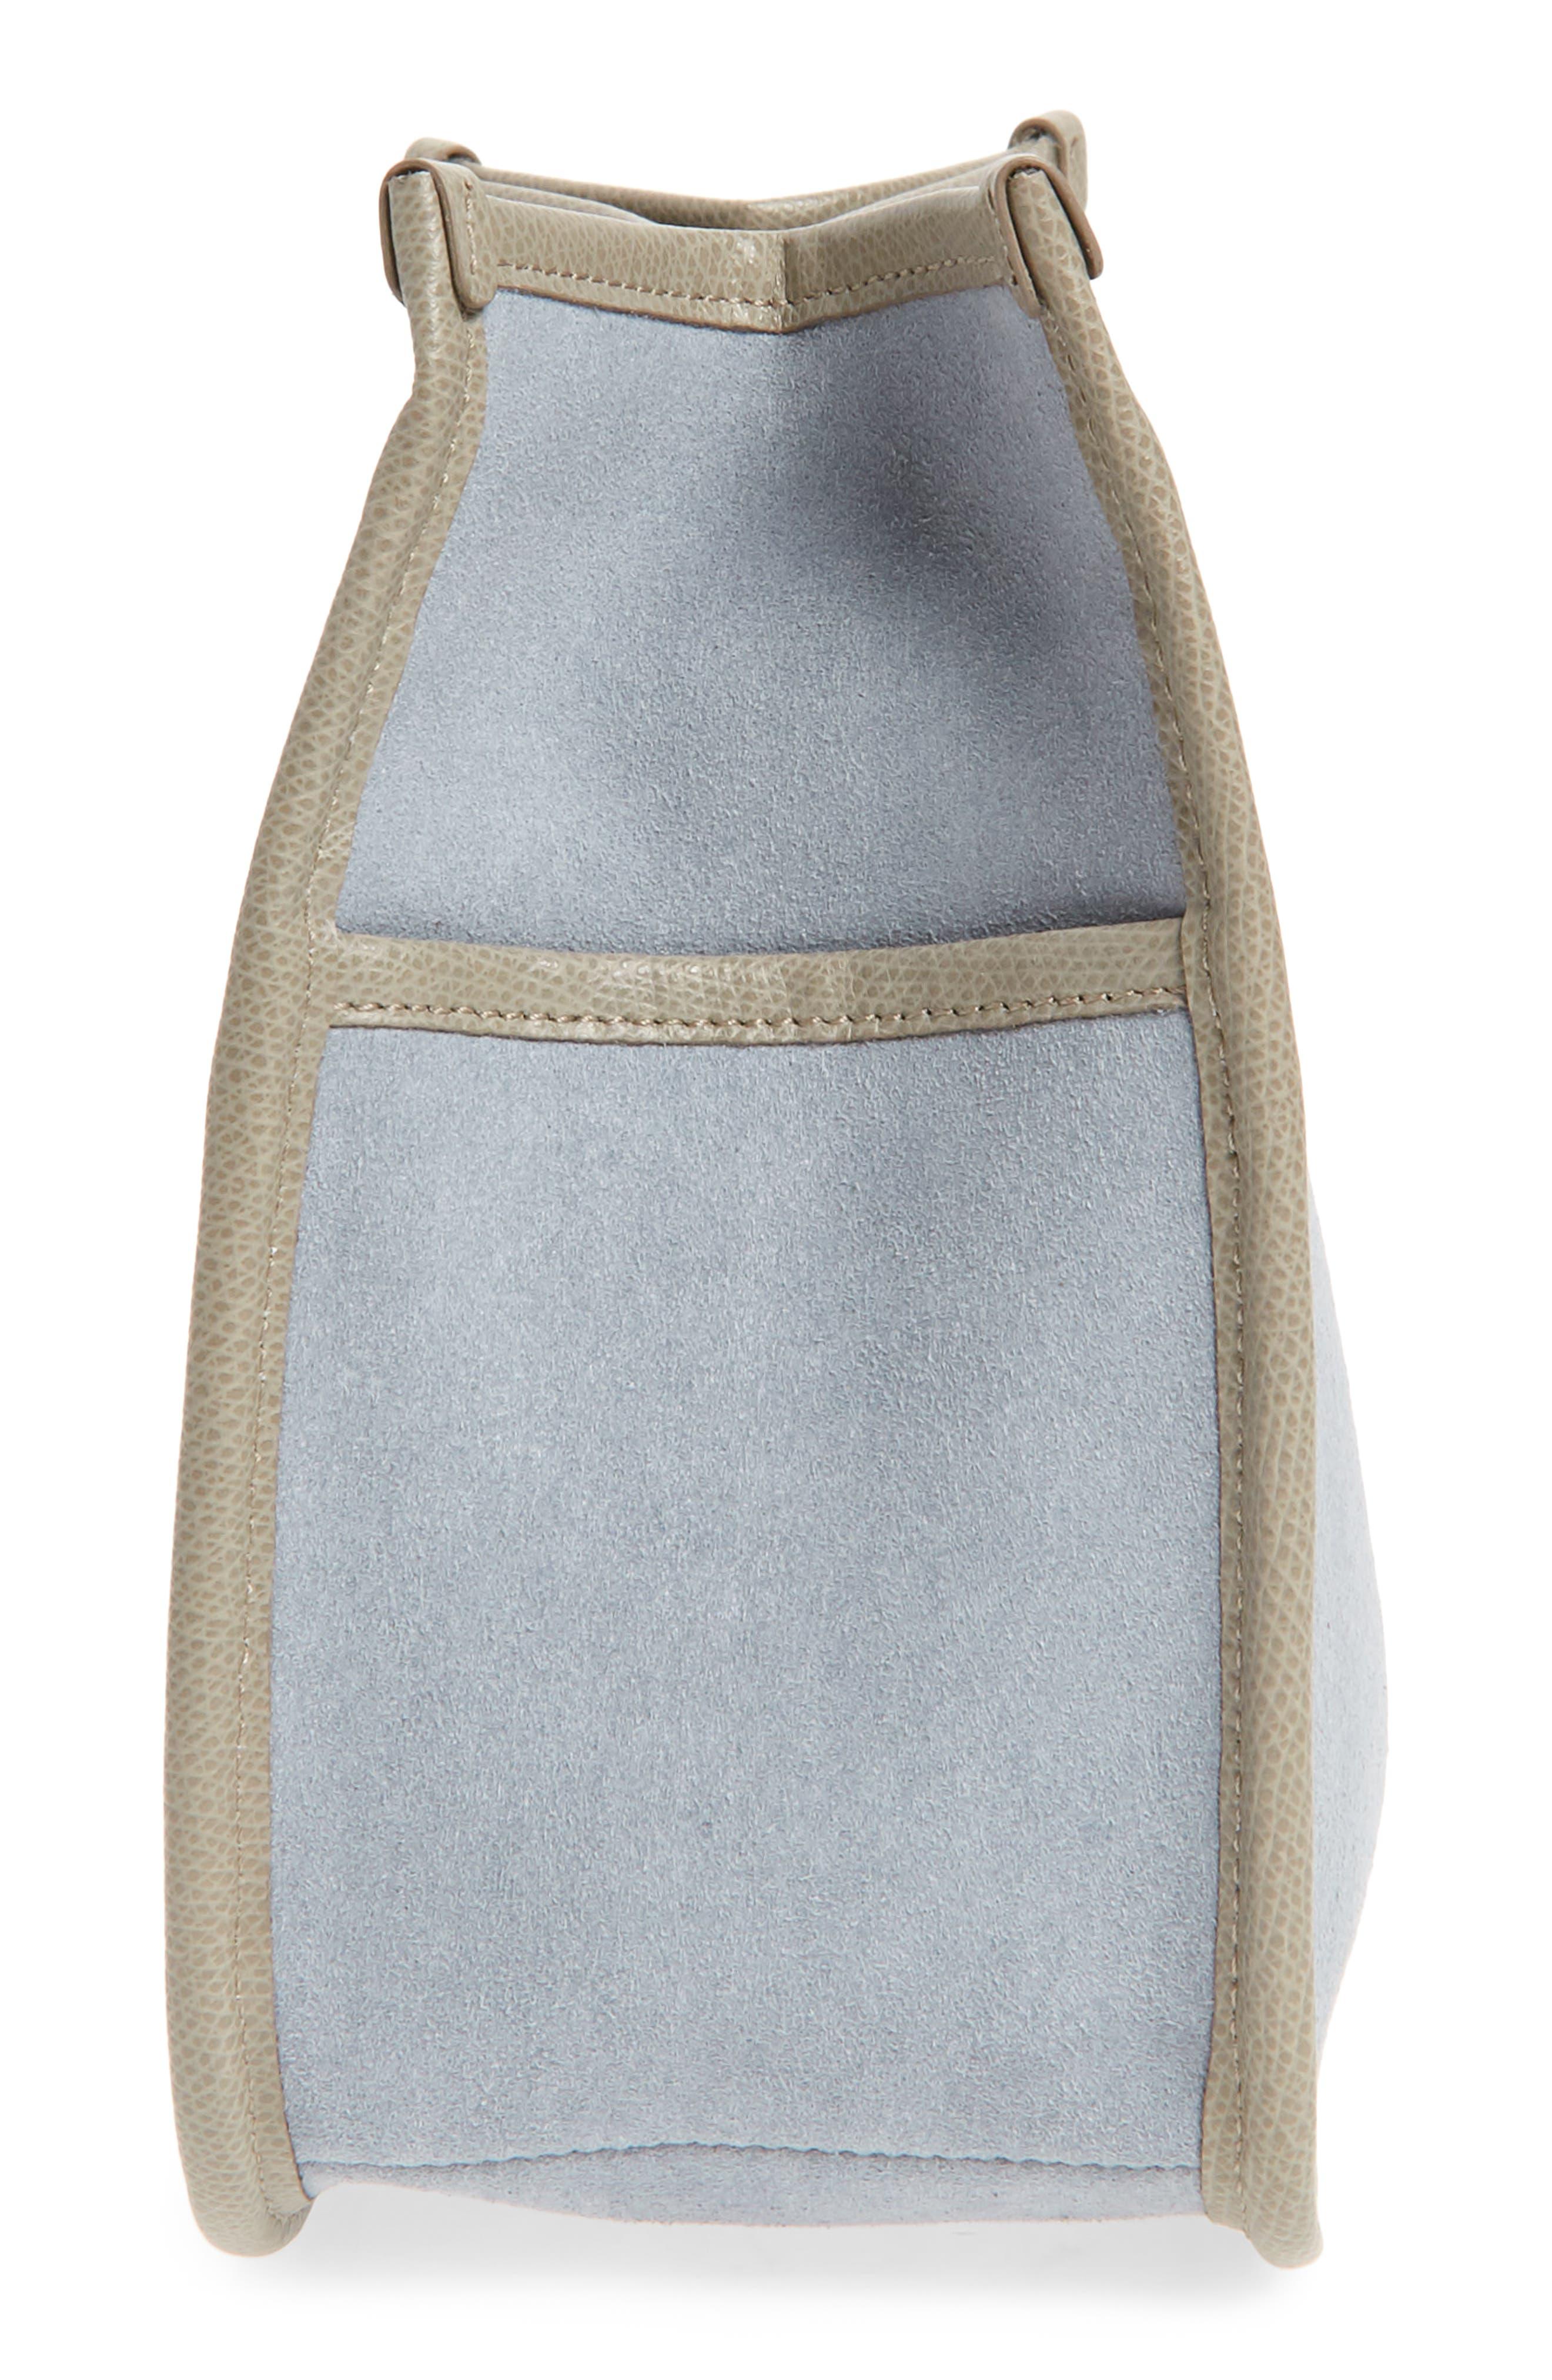 Caddy Microsuede Handbag Organizer,                             Alternate thumbnail 4, color,                             Sand